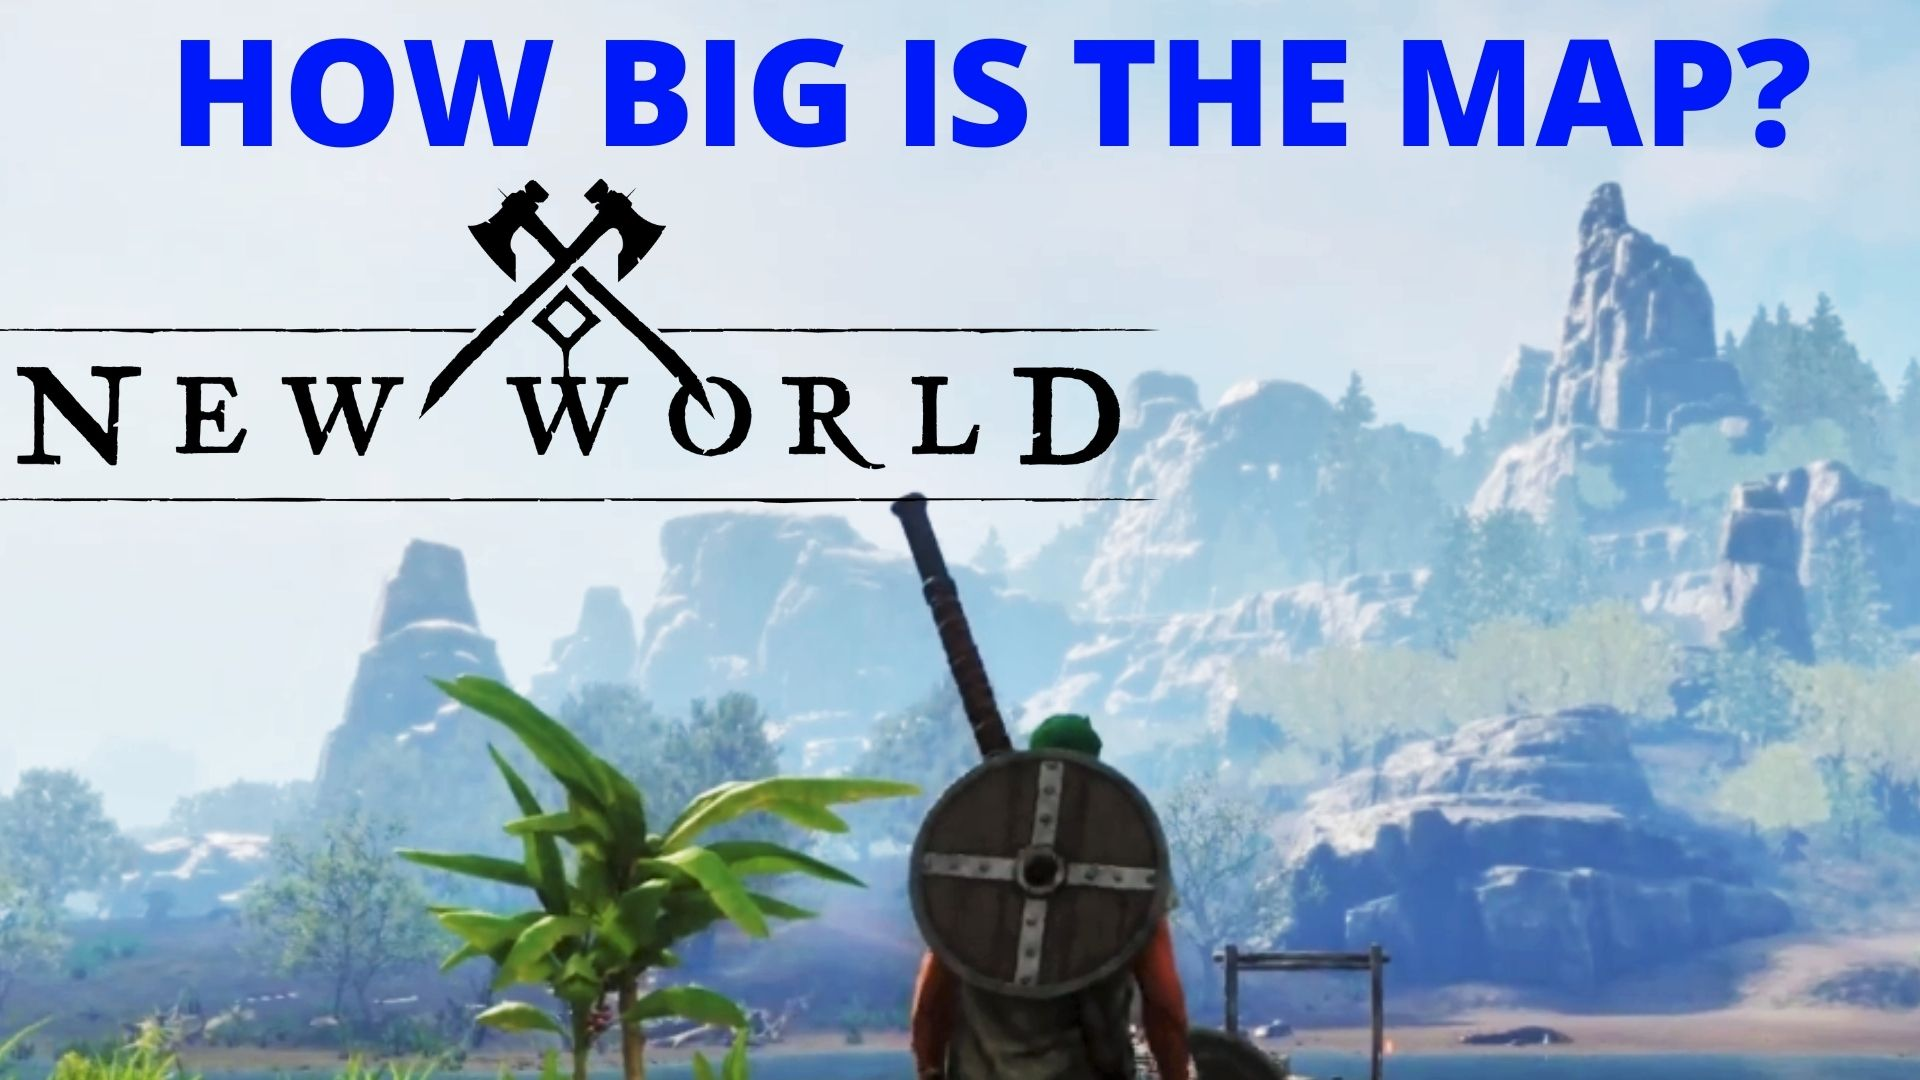 New World Map size